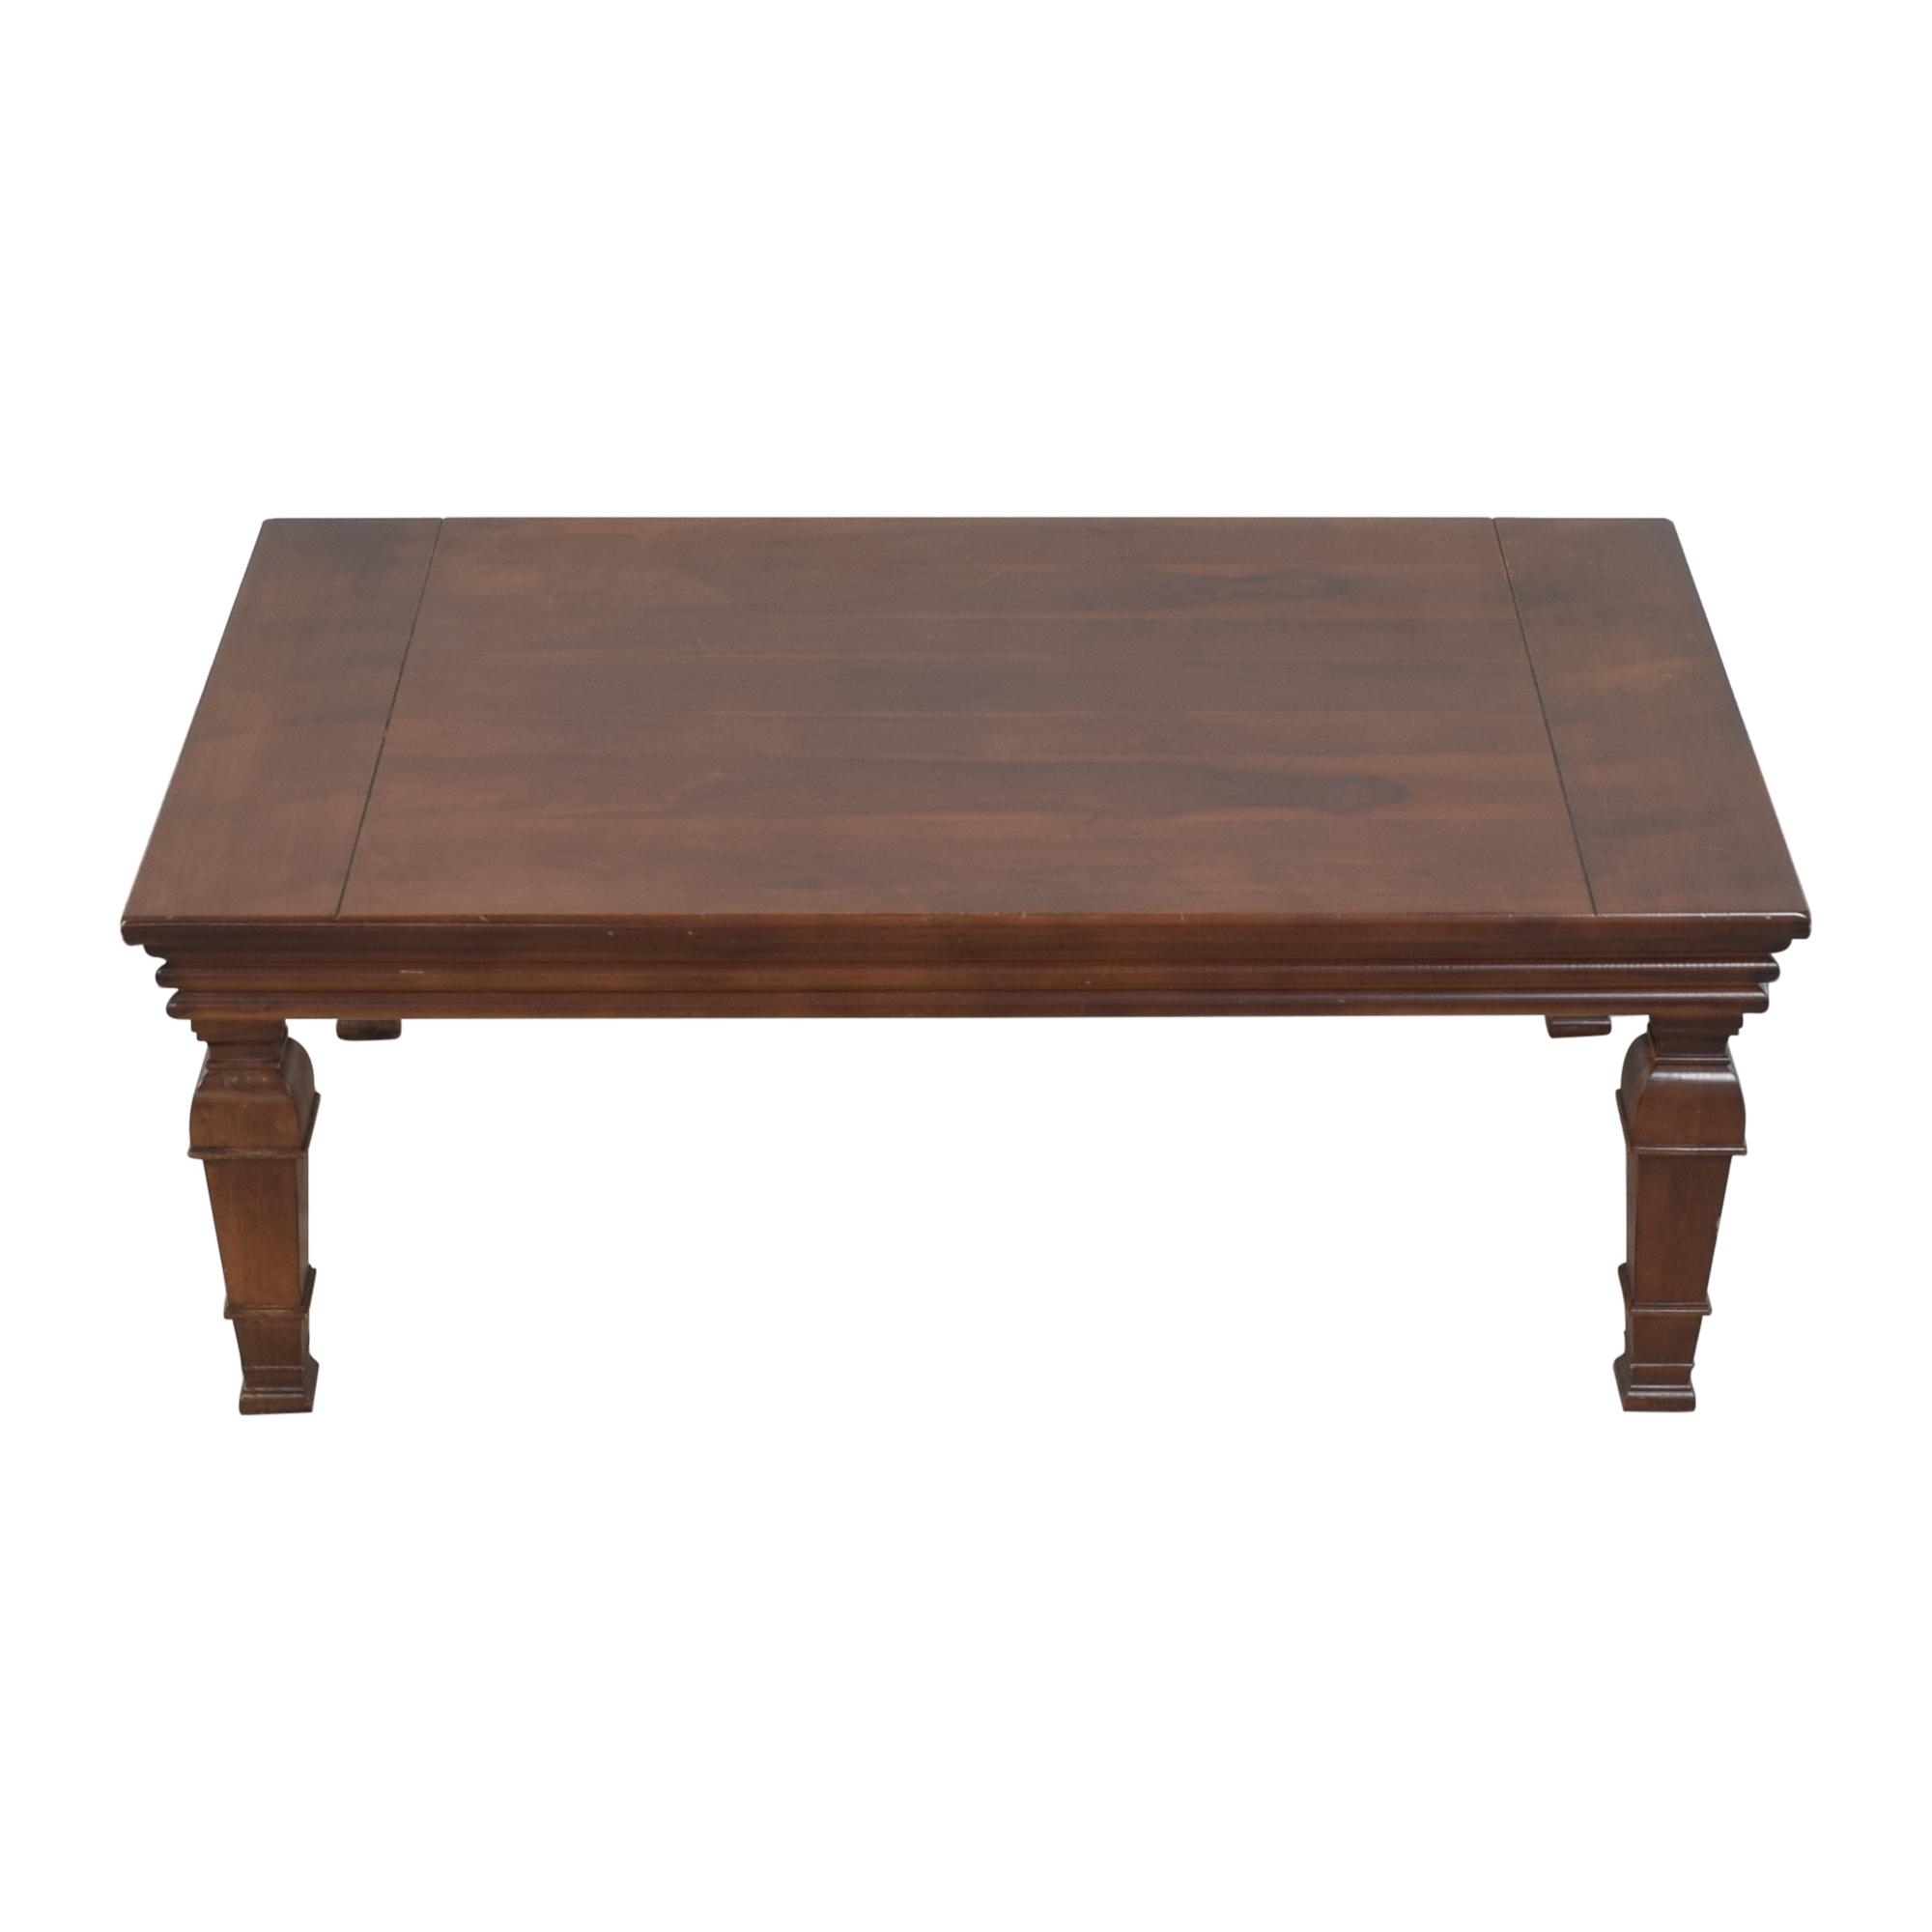 Lane Furniture Lane Furniture Rectangular Coffee Table Coffee Tables